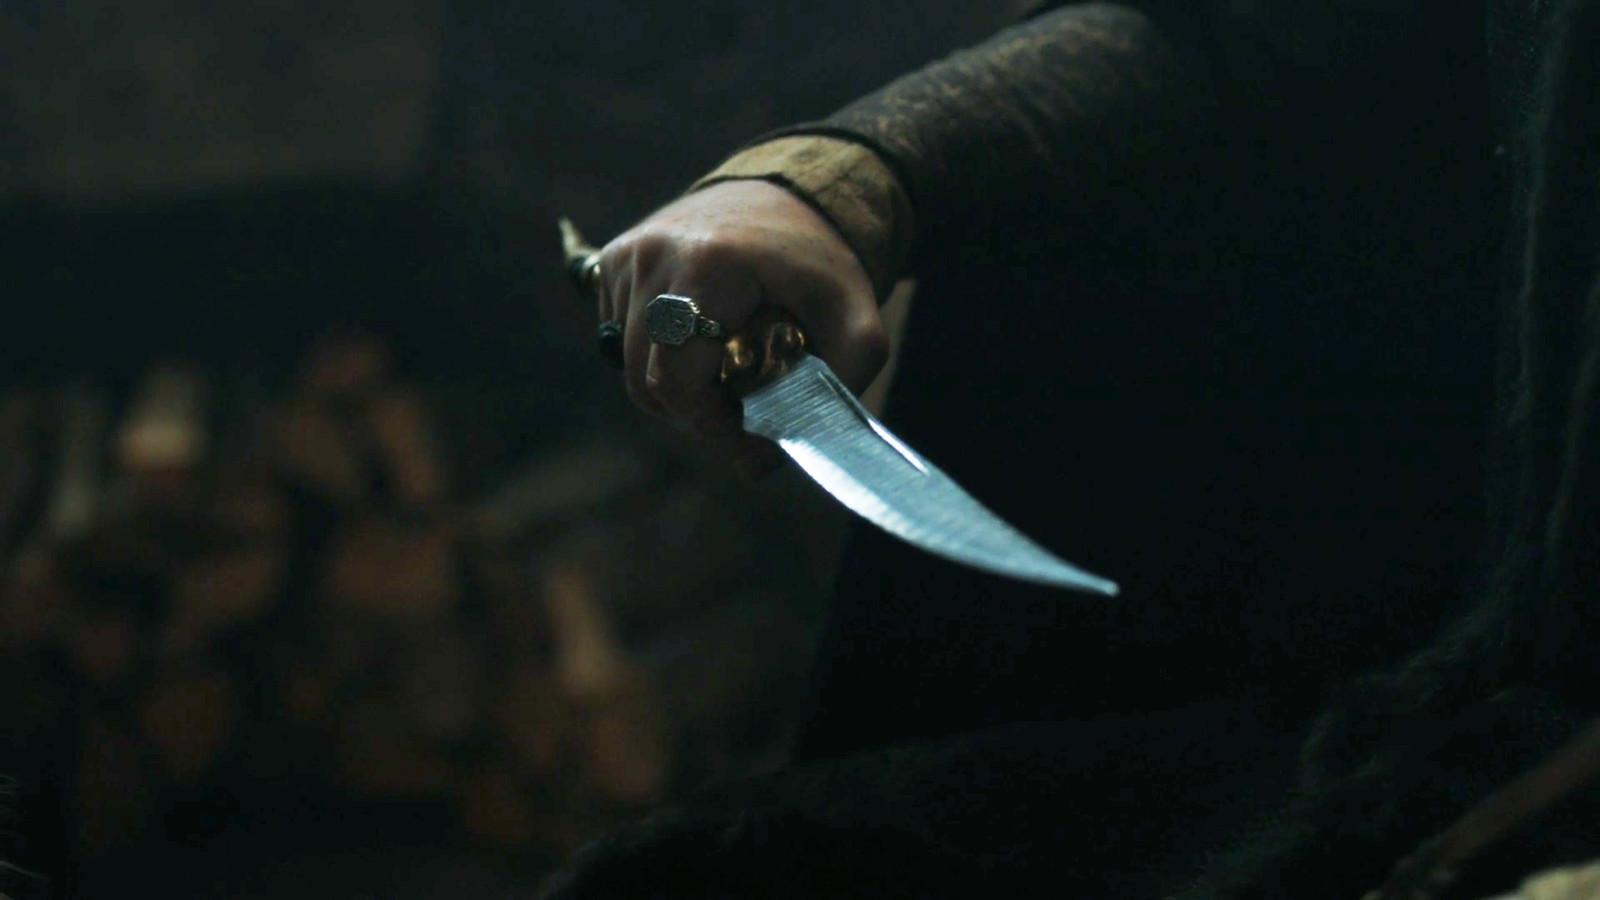 Game of Thrones – Stagione 1 DVDrip Sub ITA (Completa ...